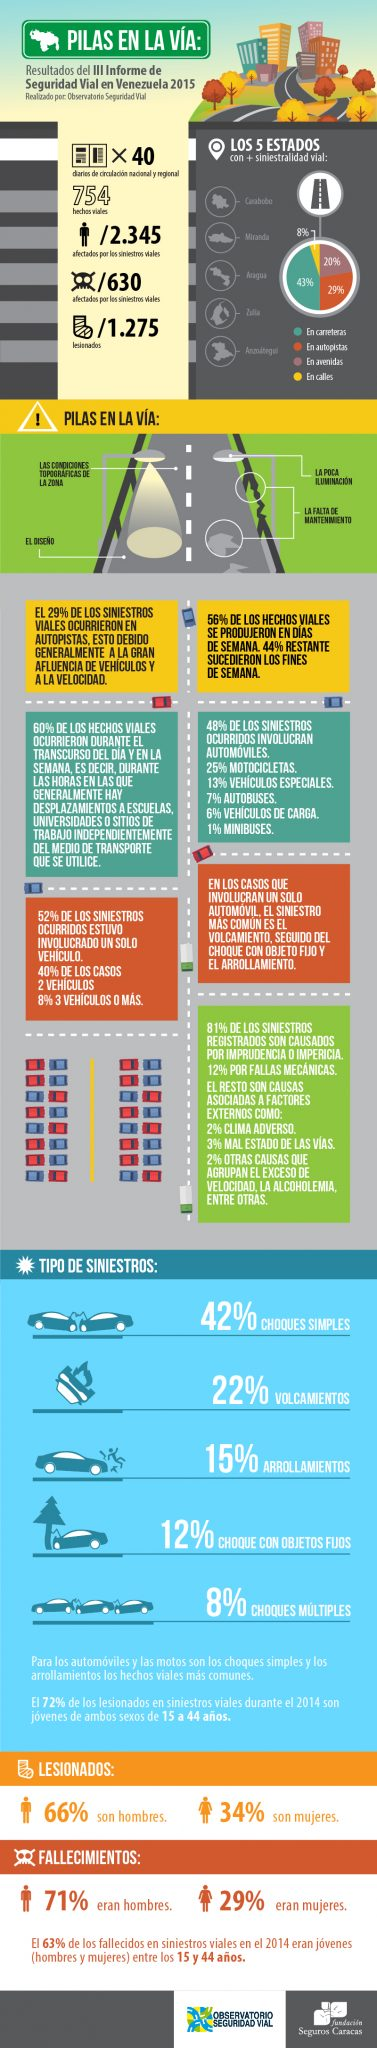 infografia-seguridad-vial-venezuela